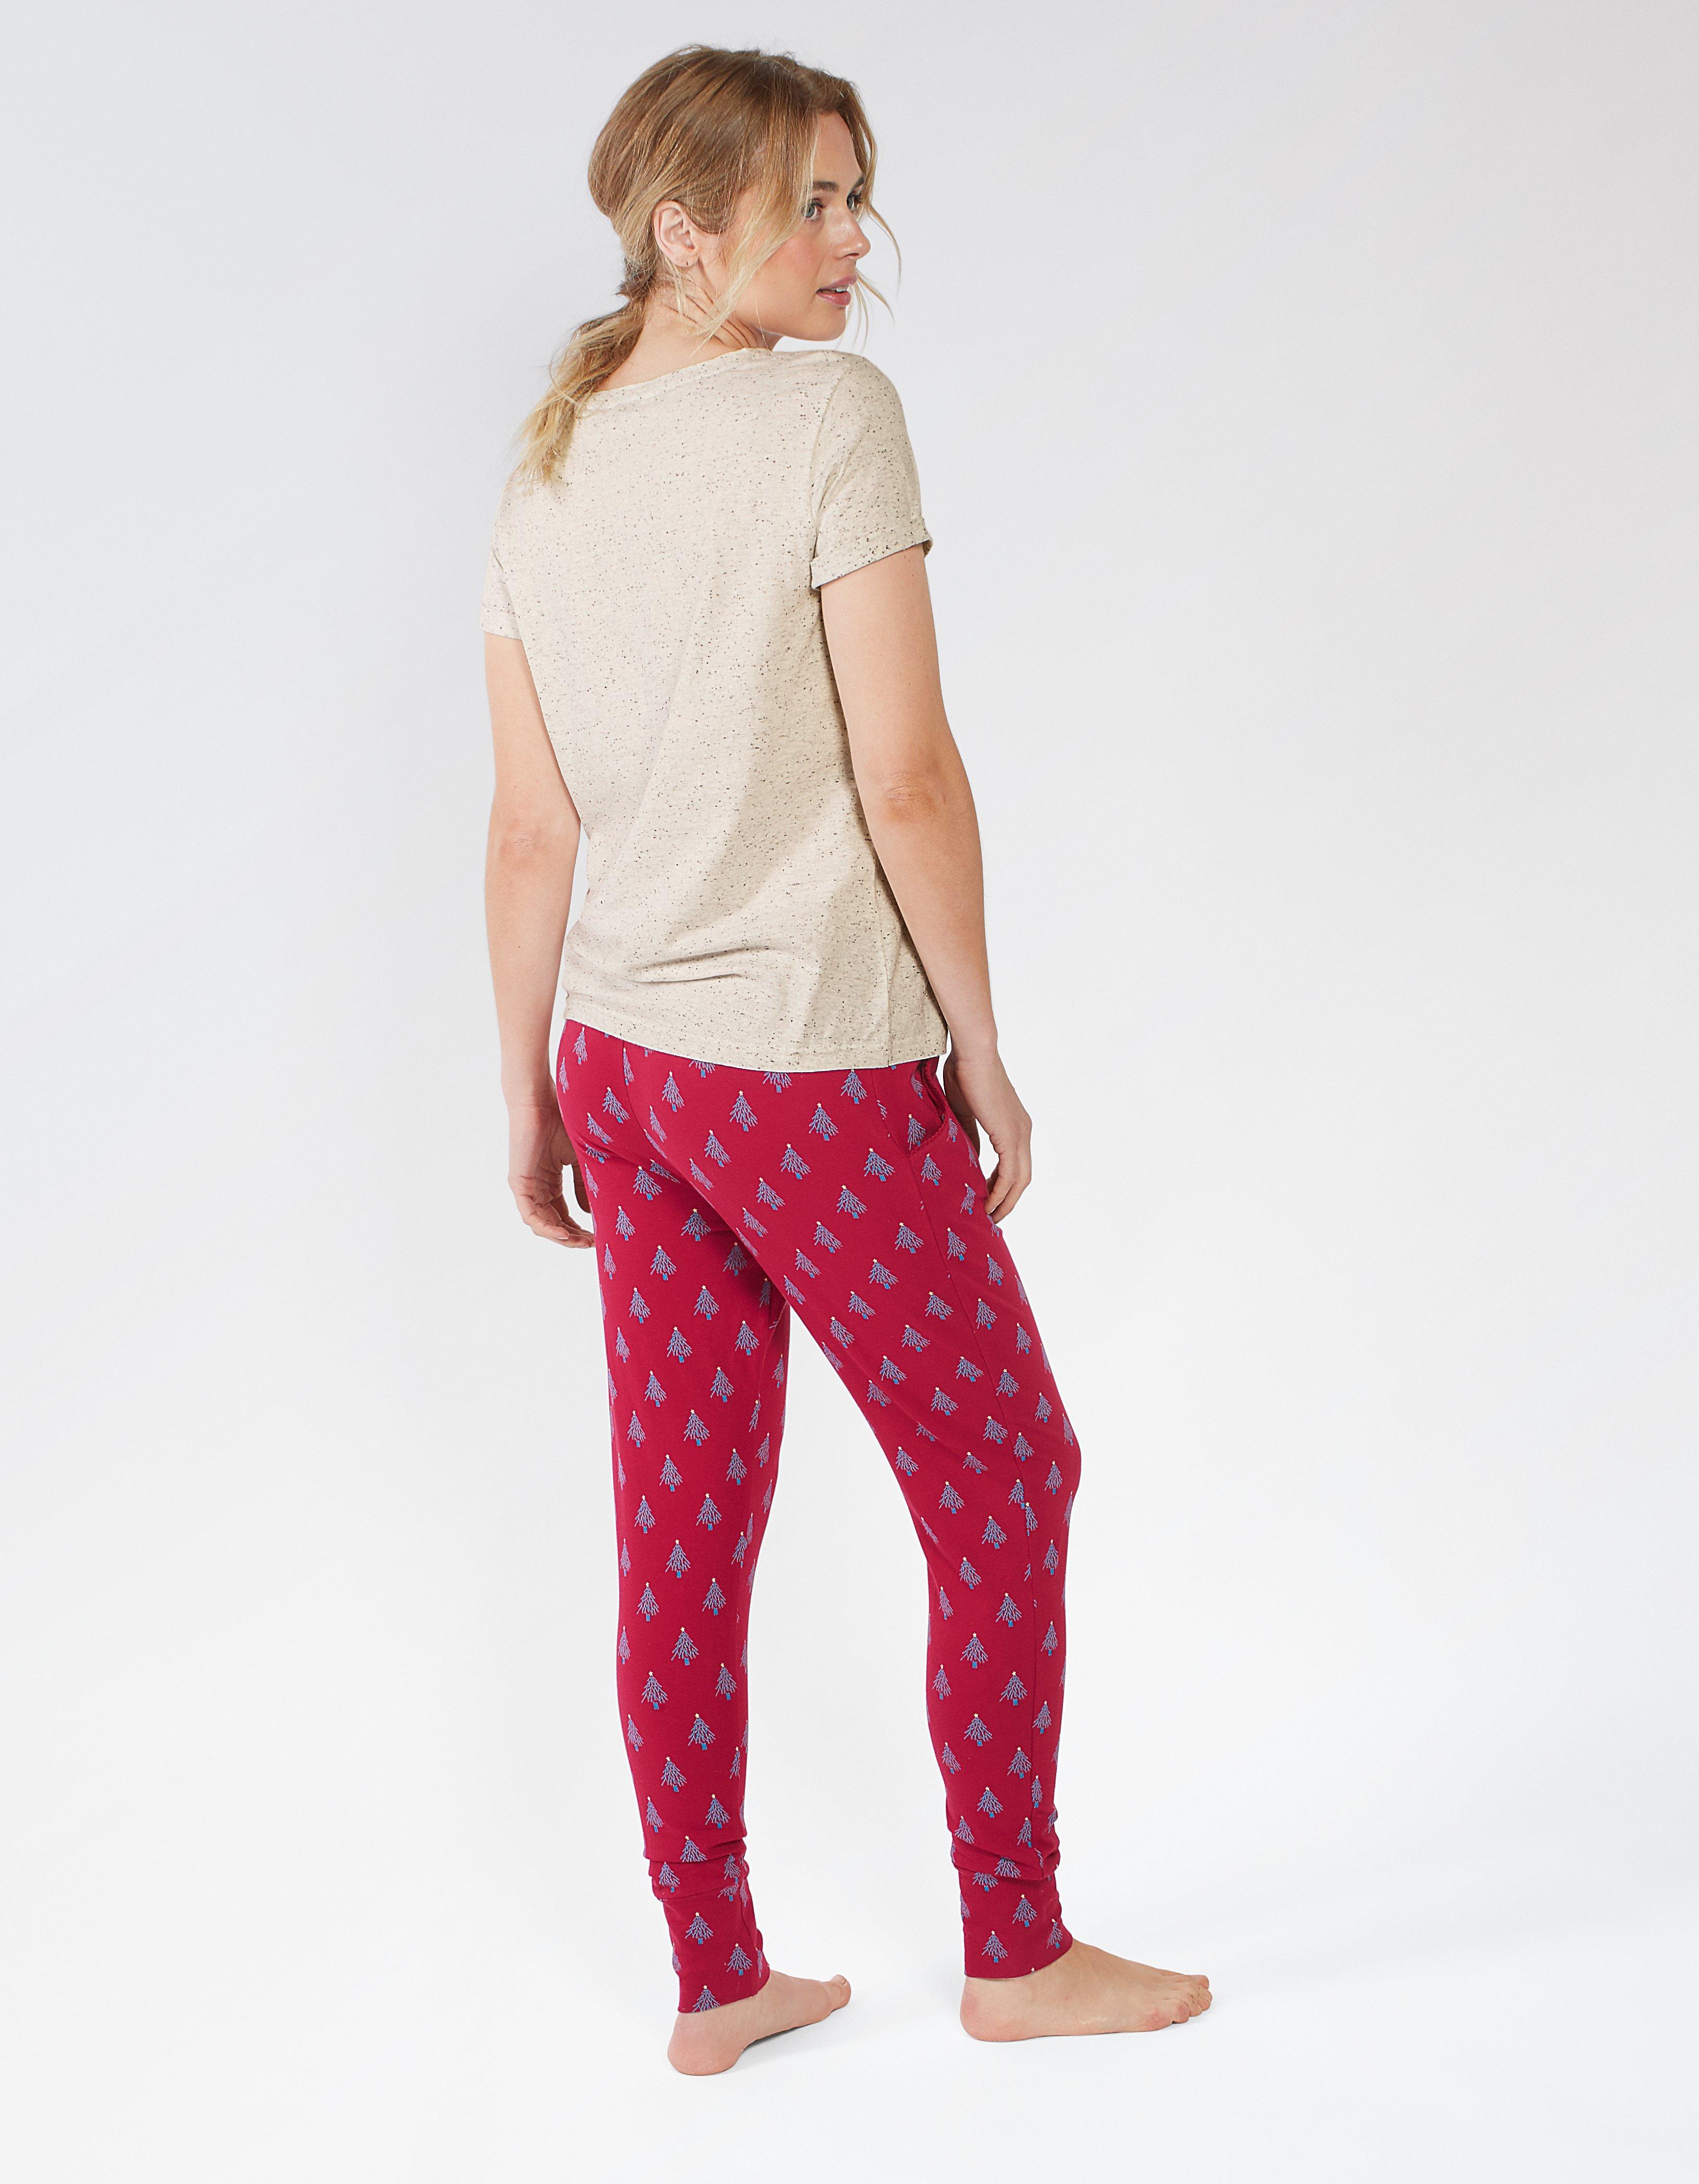 Treemendous Leggings Pyjama Set